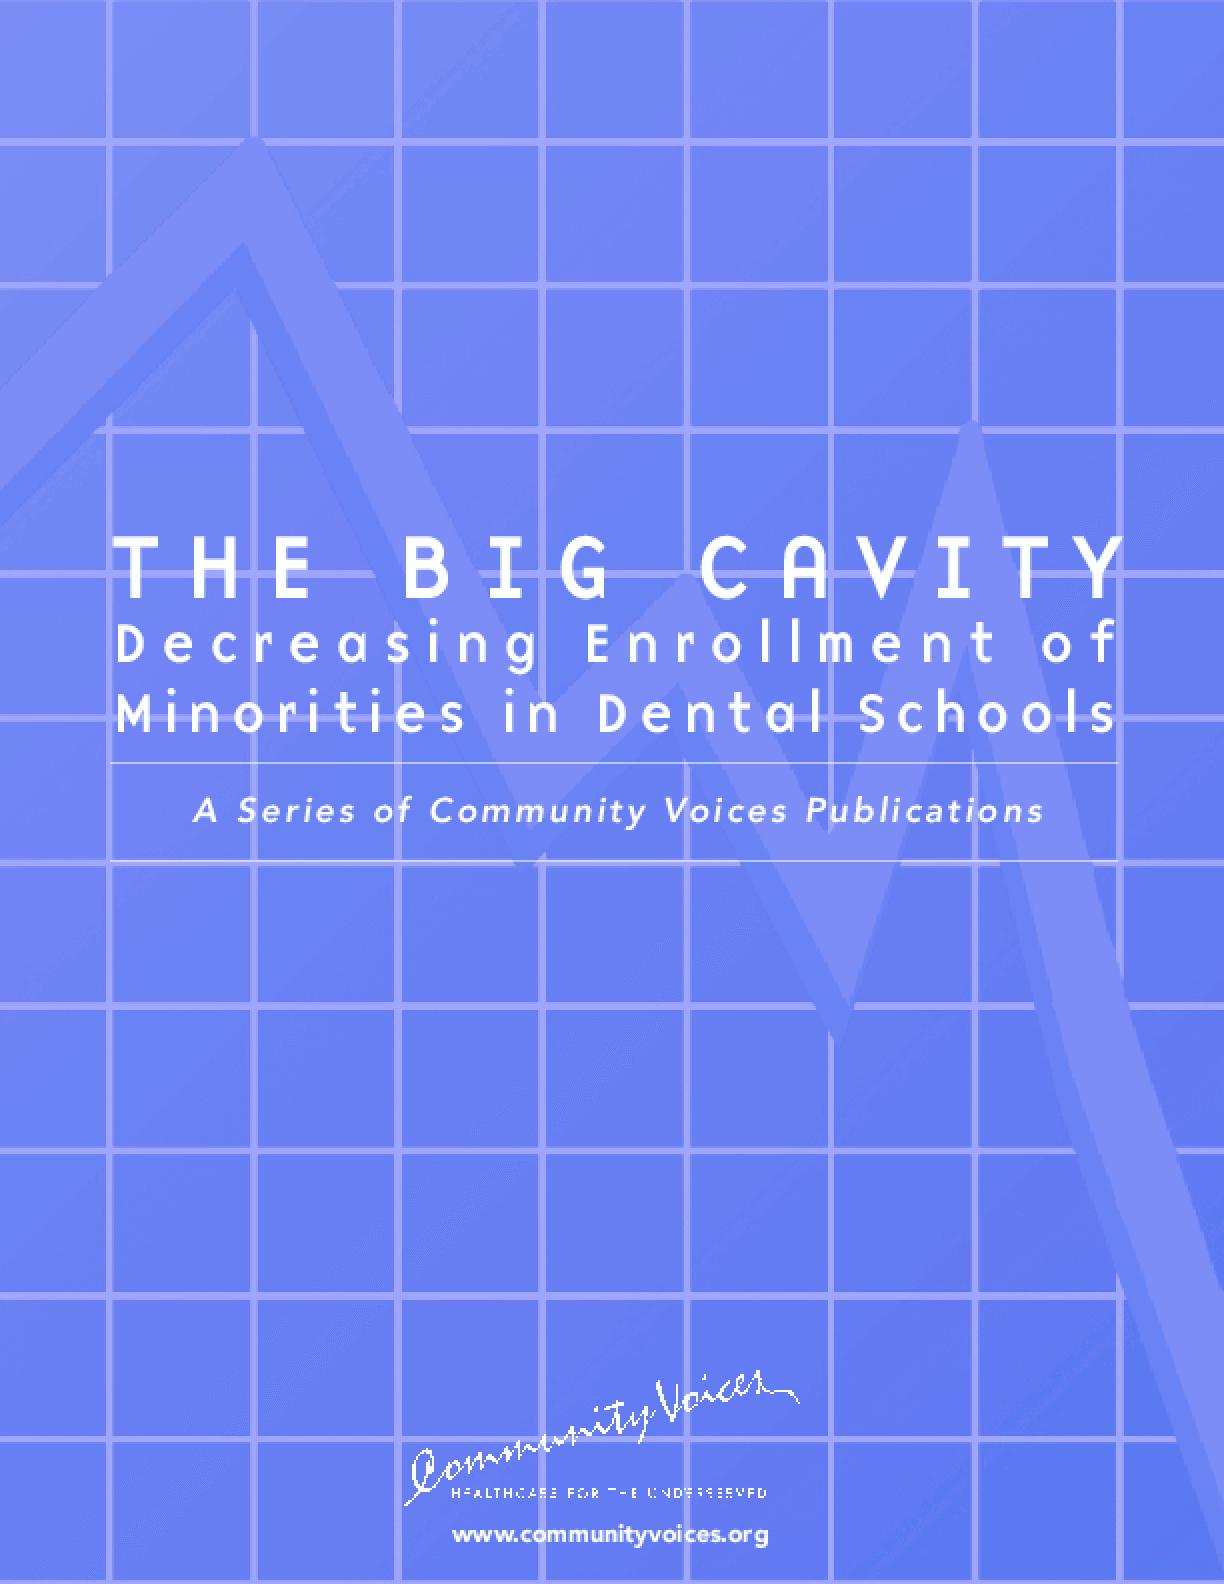 The Big Cavity: Decreasing Enrollment of Minorities in Dental Schools